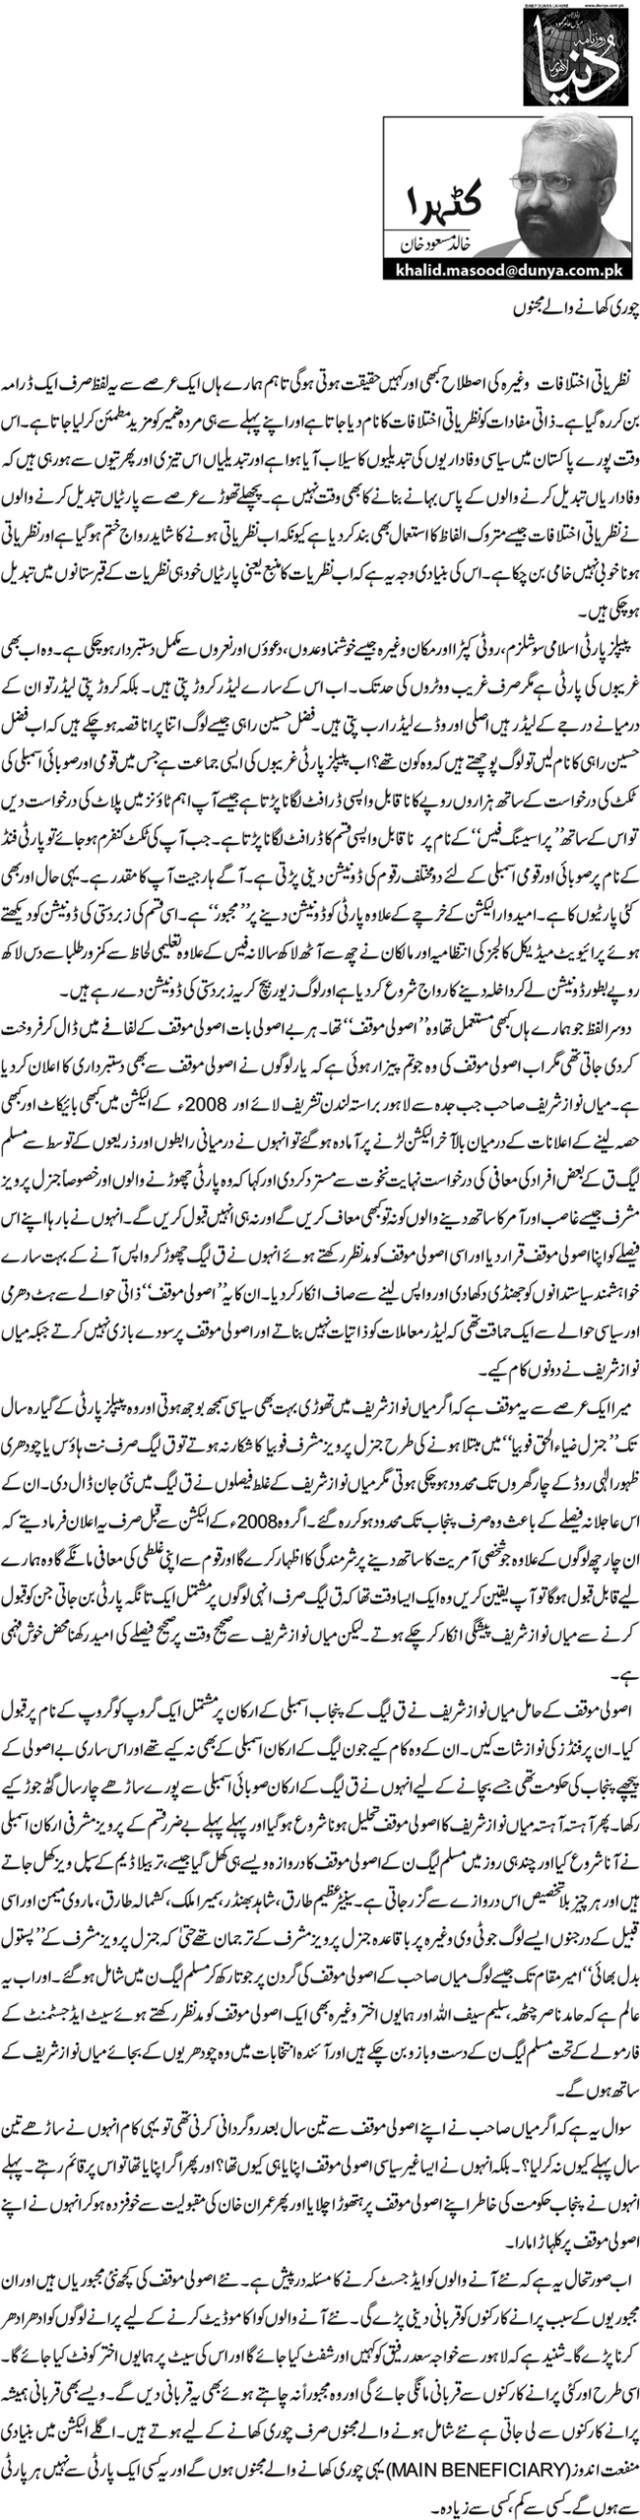 Chori khanay walay majno - Khalid Masood Khan